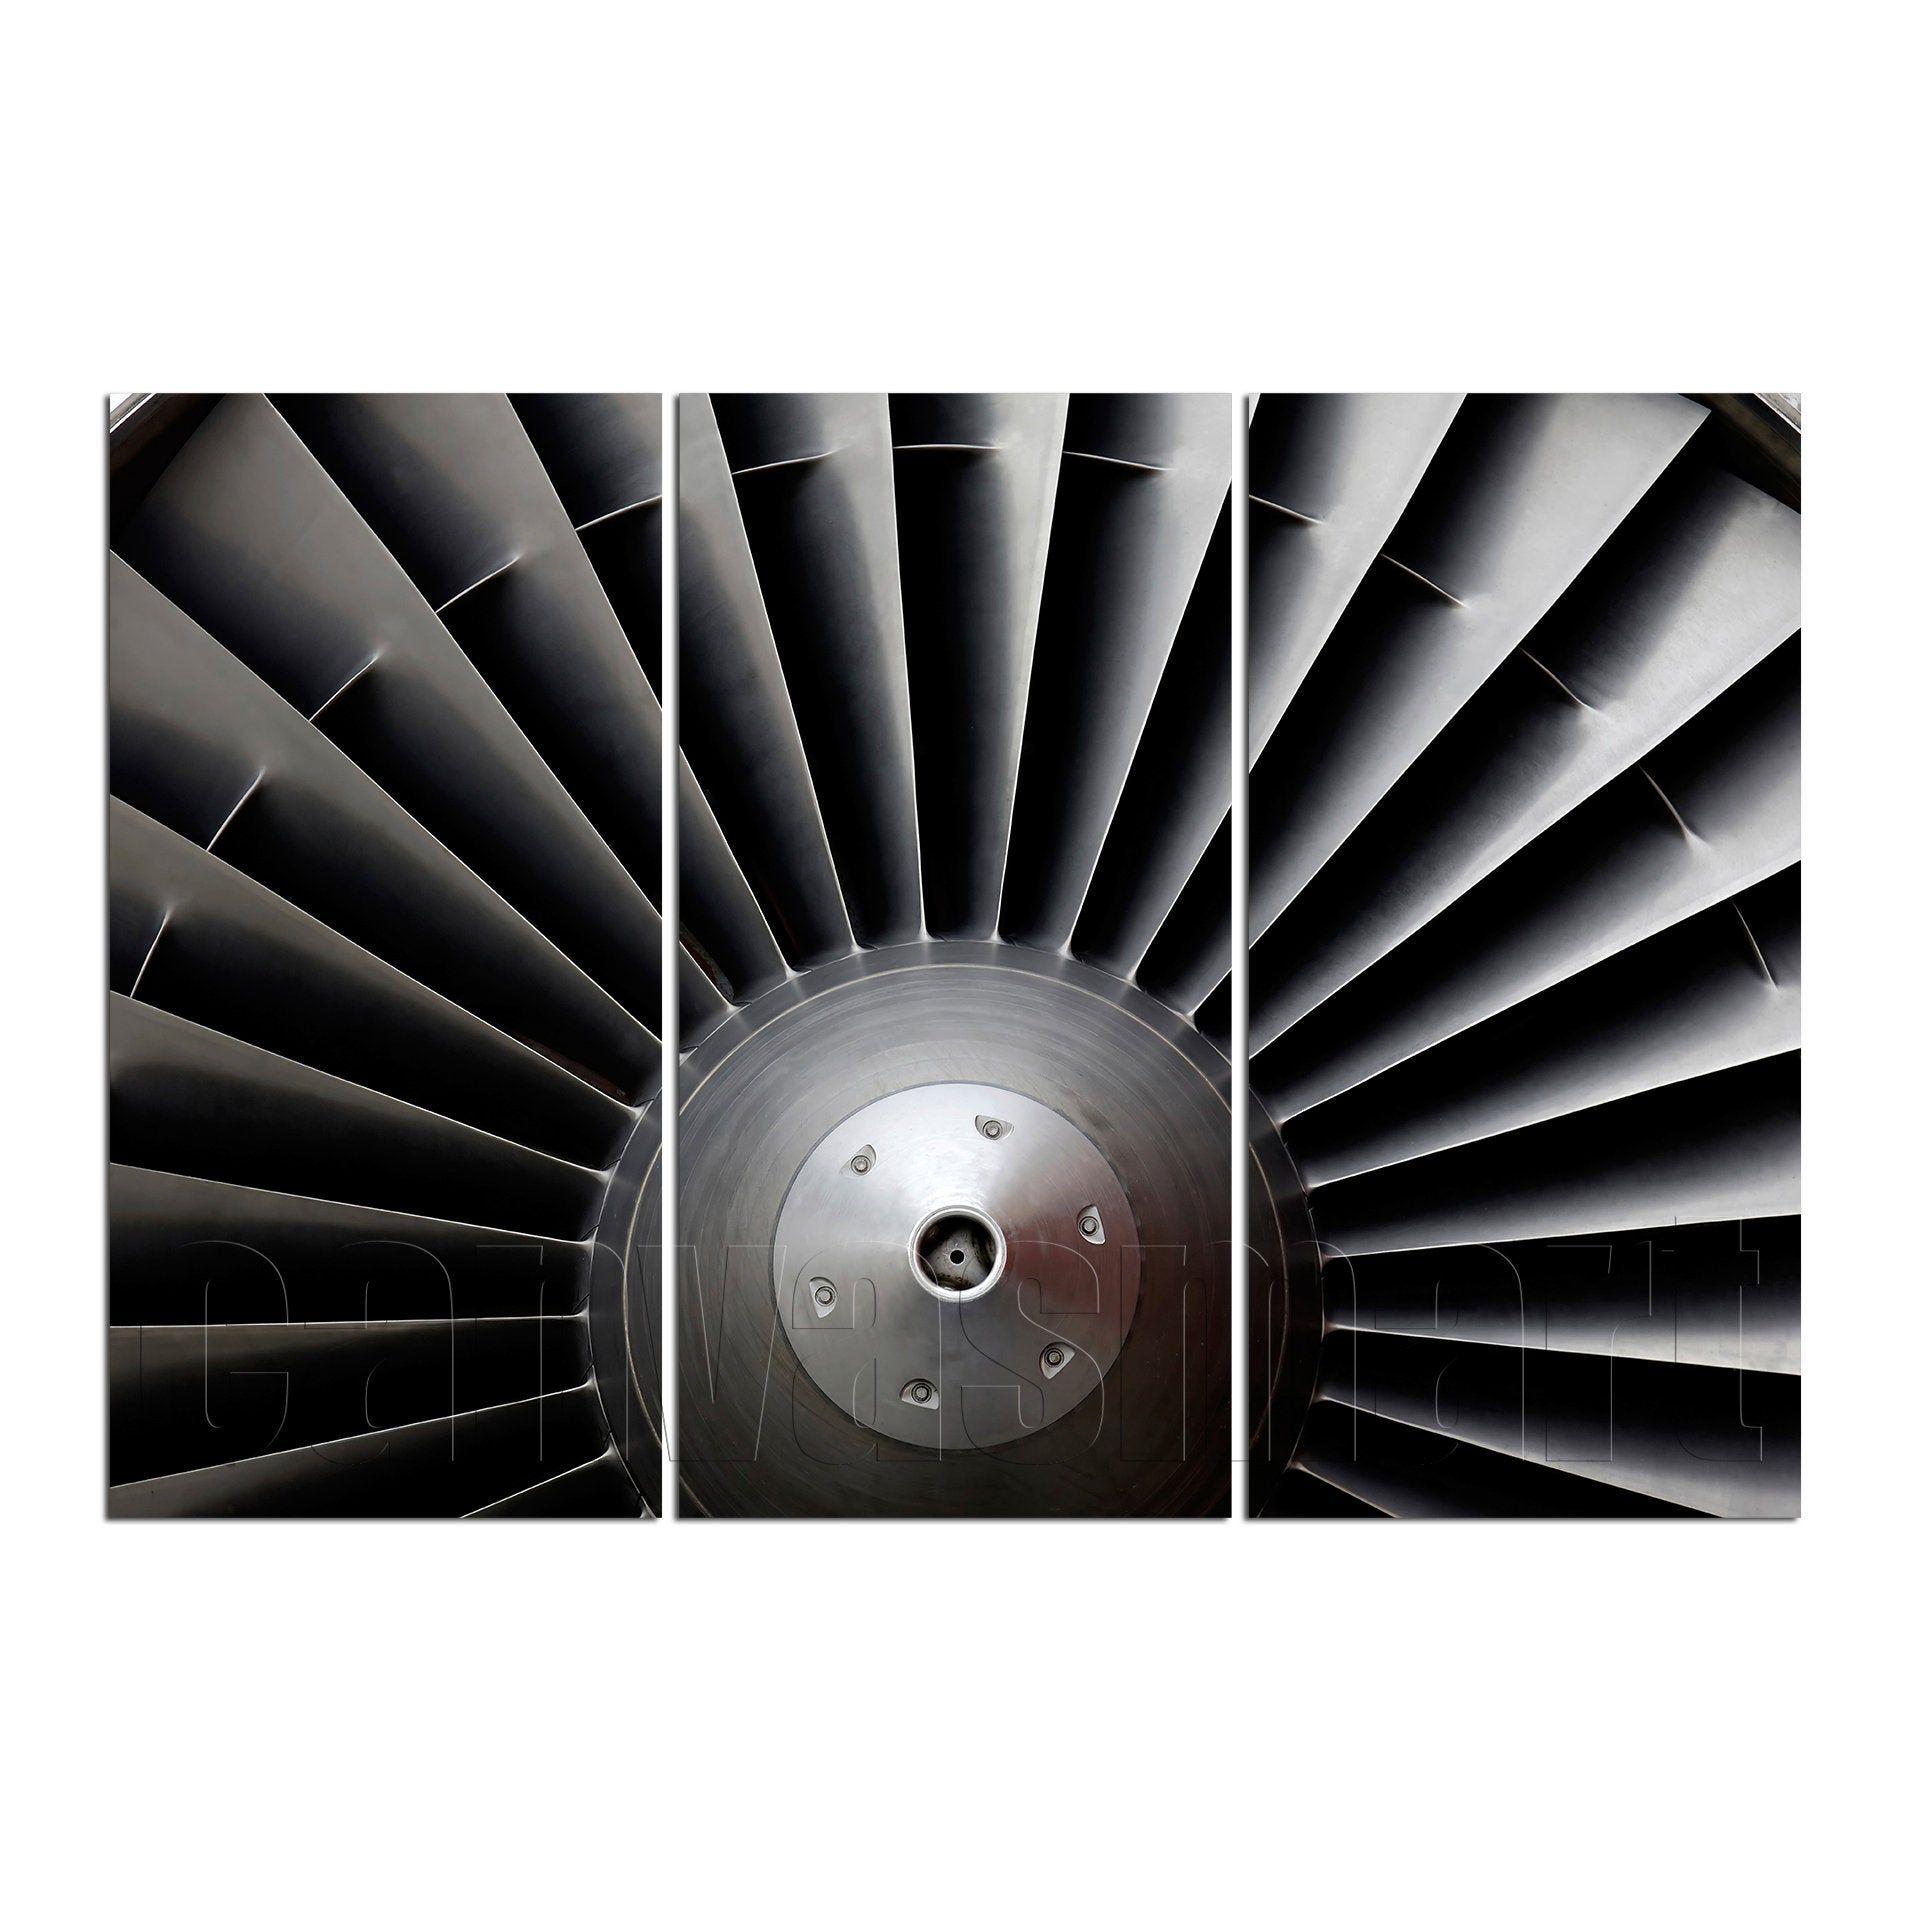 Airplane Aircraft Turbine Turbofan Engine Propeller ...